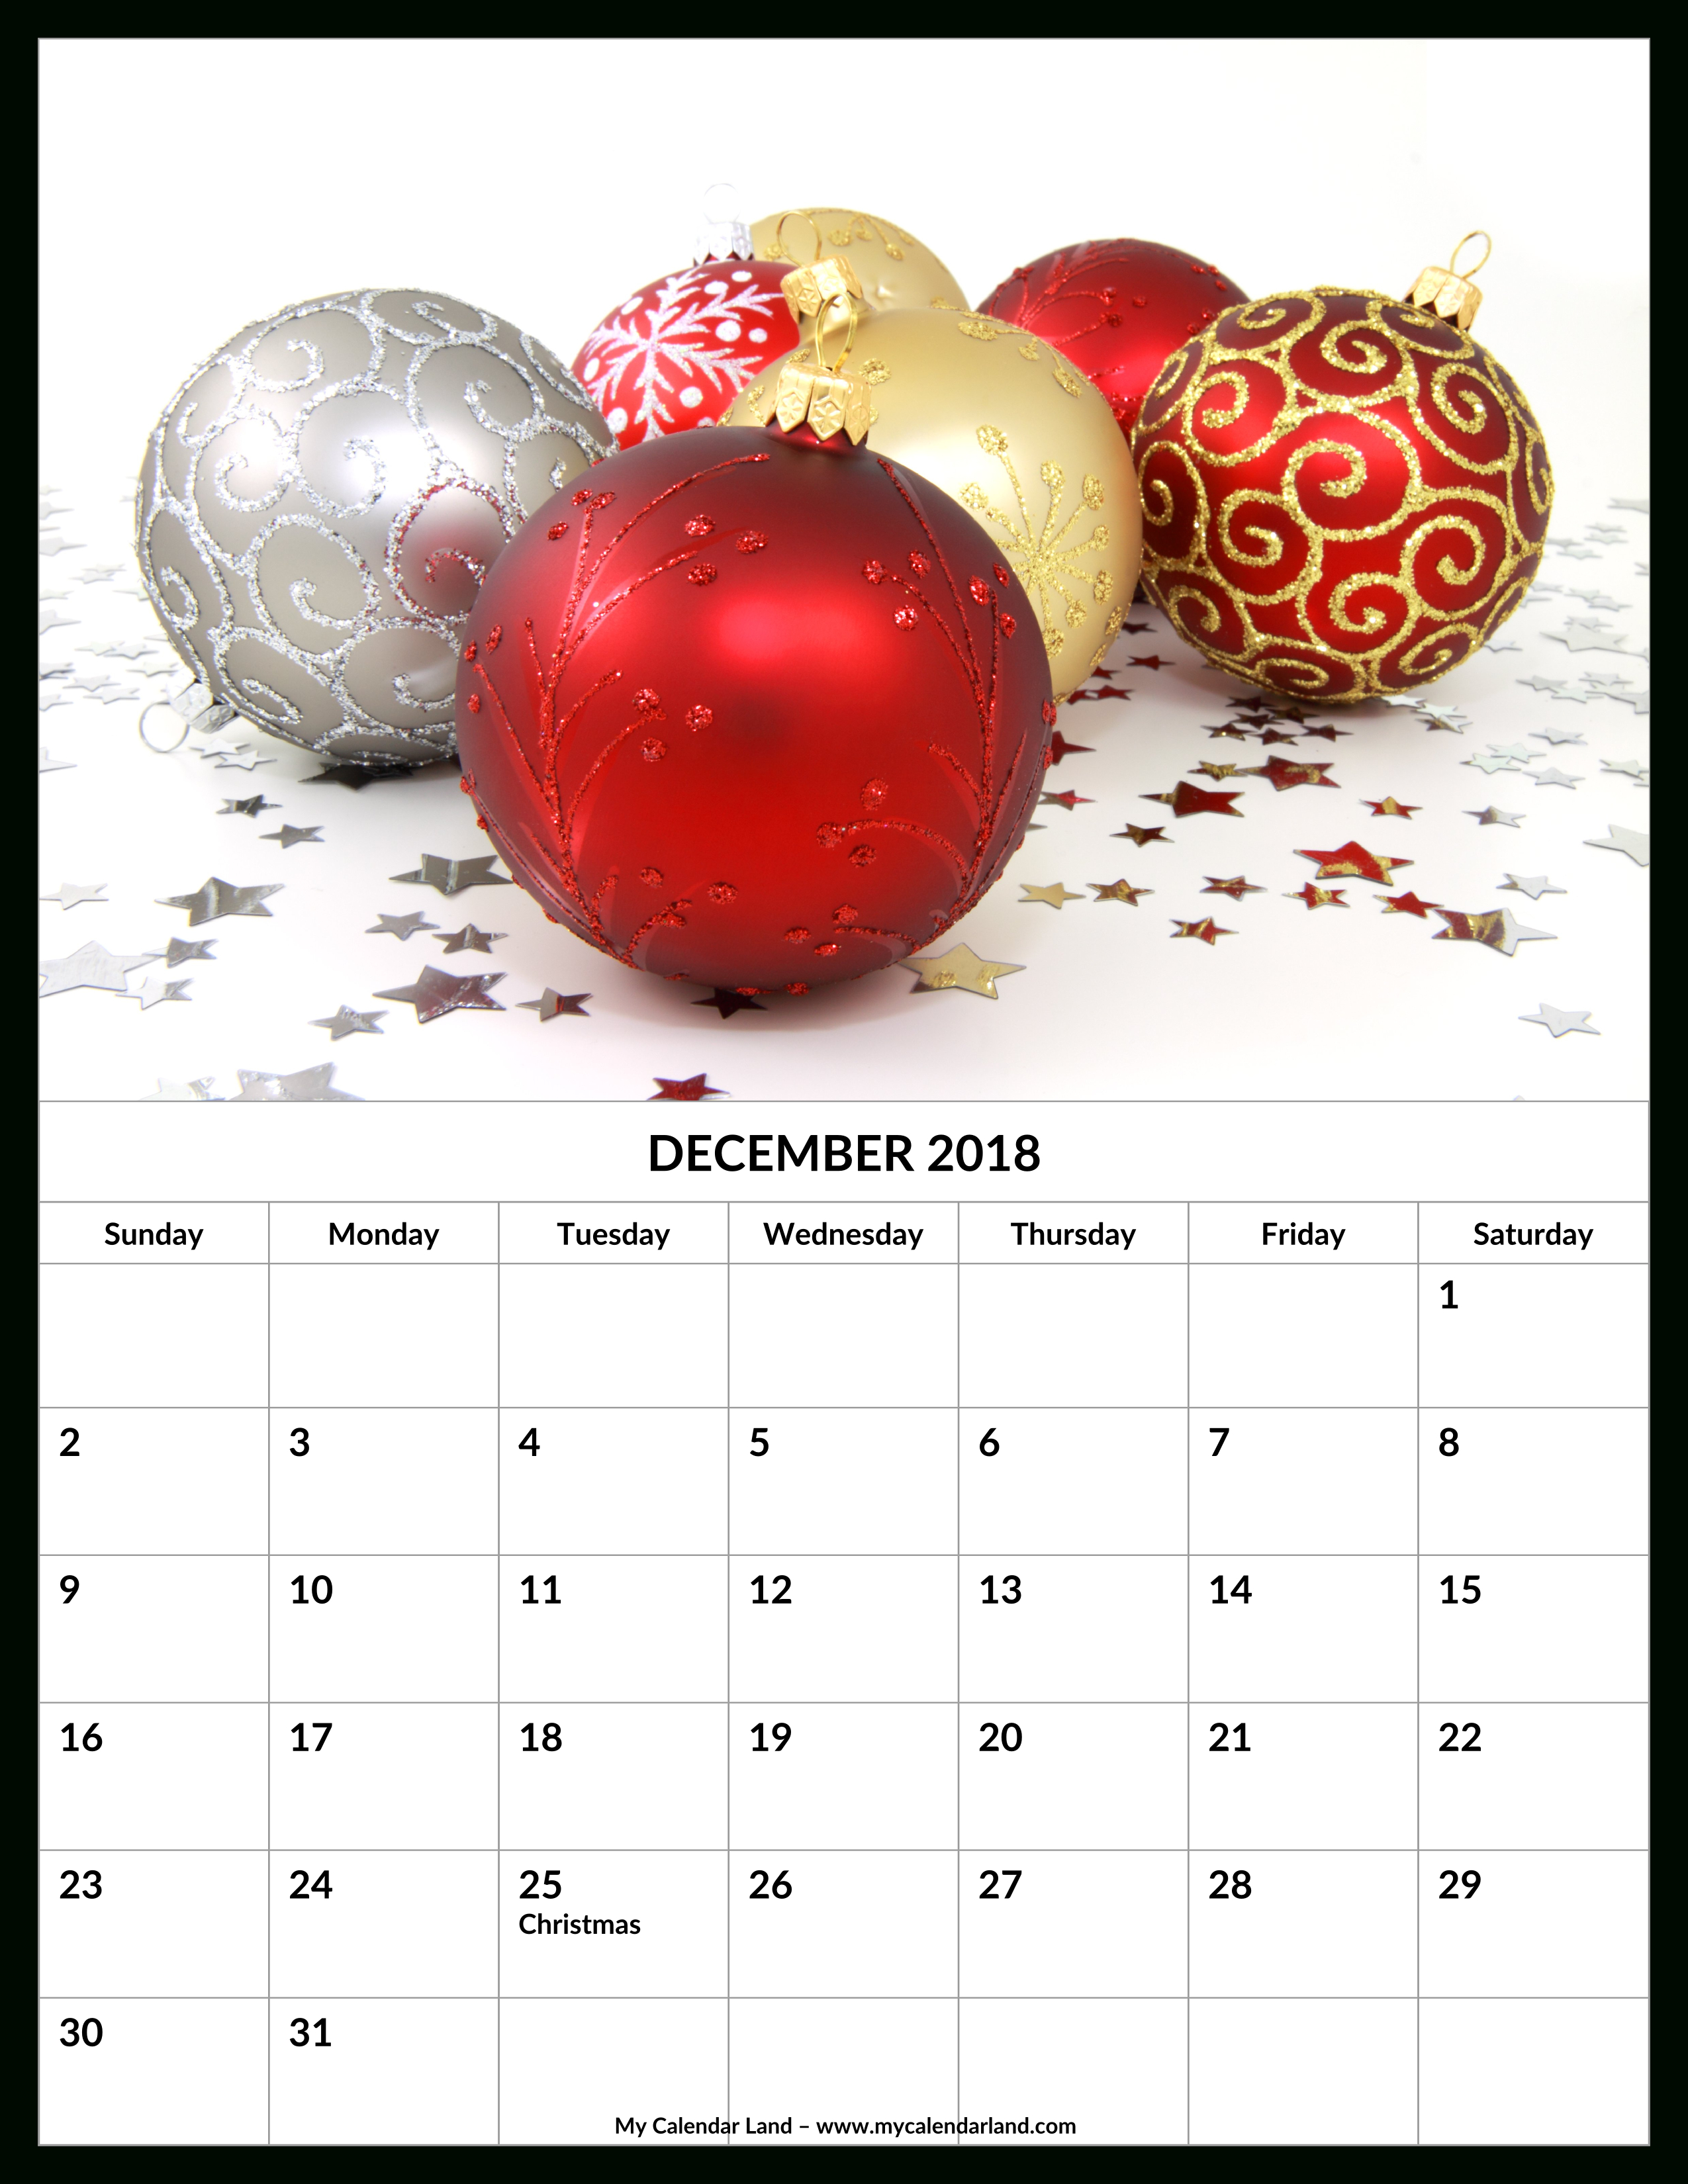 December 2018 Calendar - My Calendar Land for Christmas Themed Calendar Templates